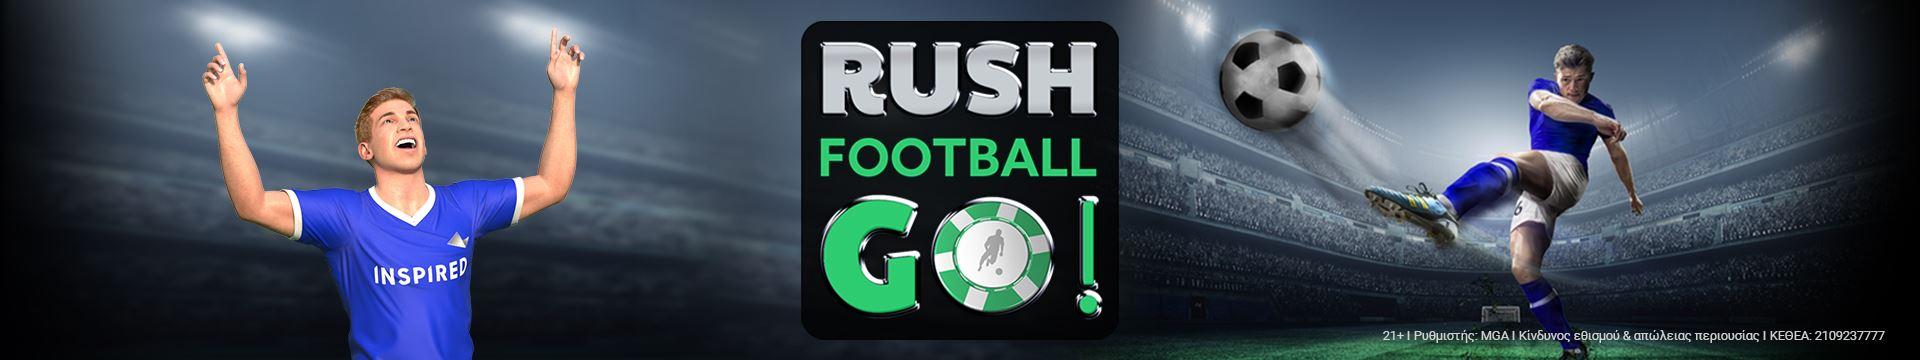 Rush_Football_Go